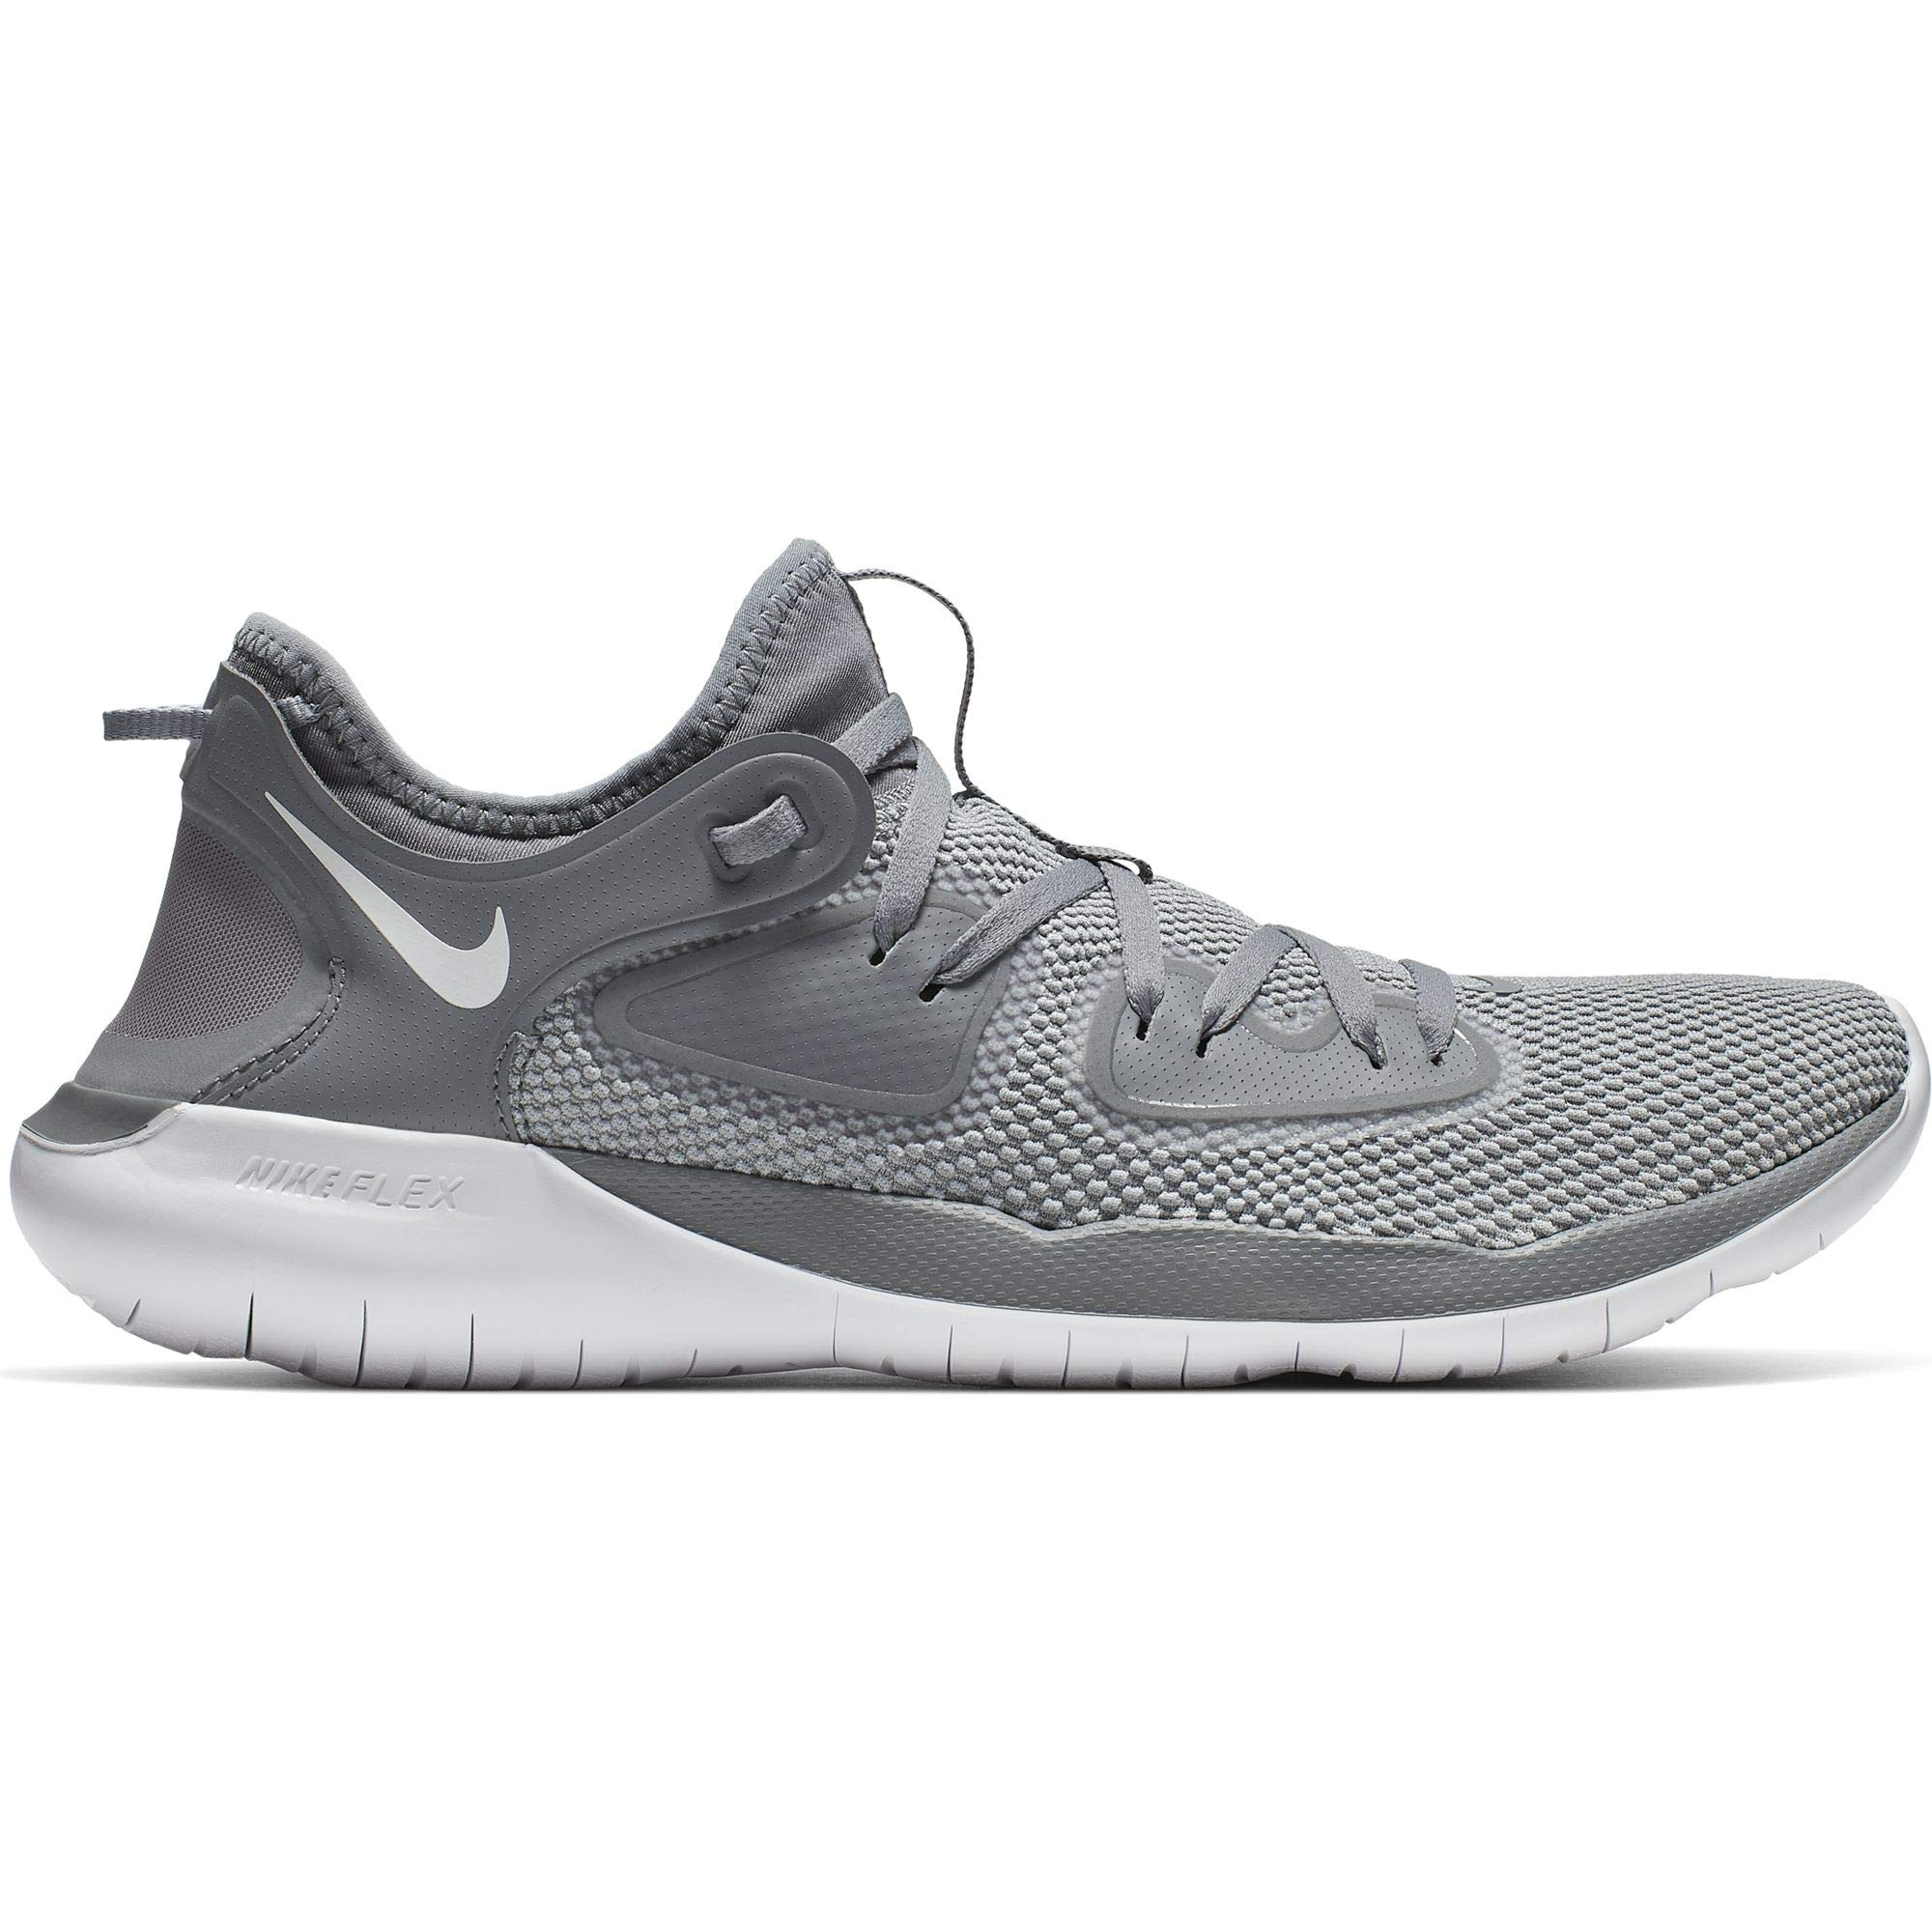 Nike flex run mens | Shipped Free at Zappos